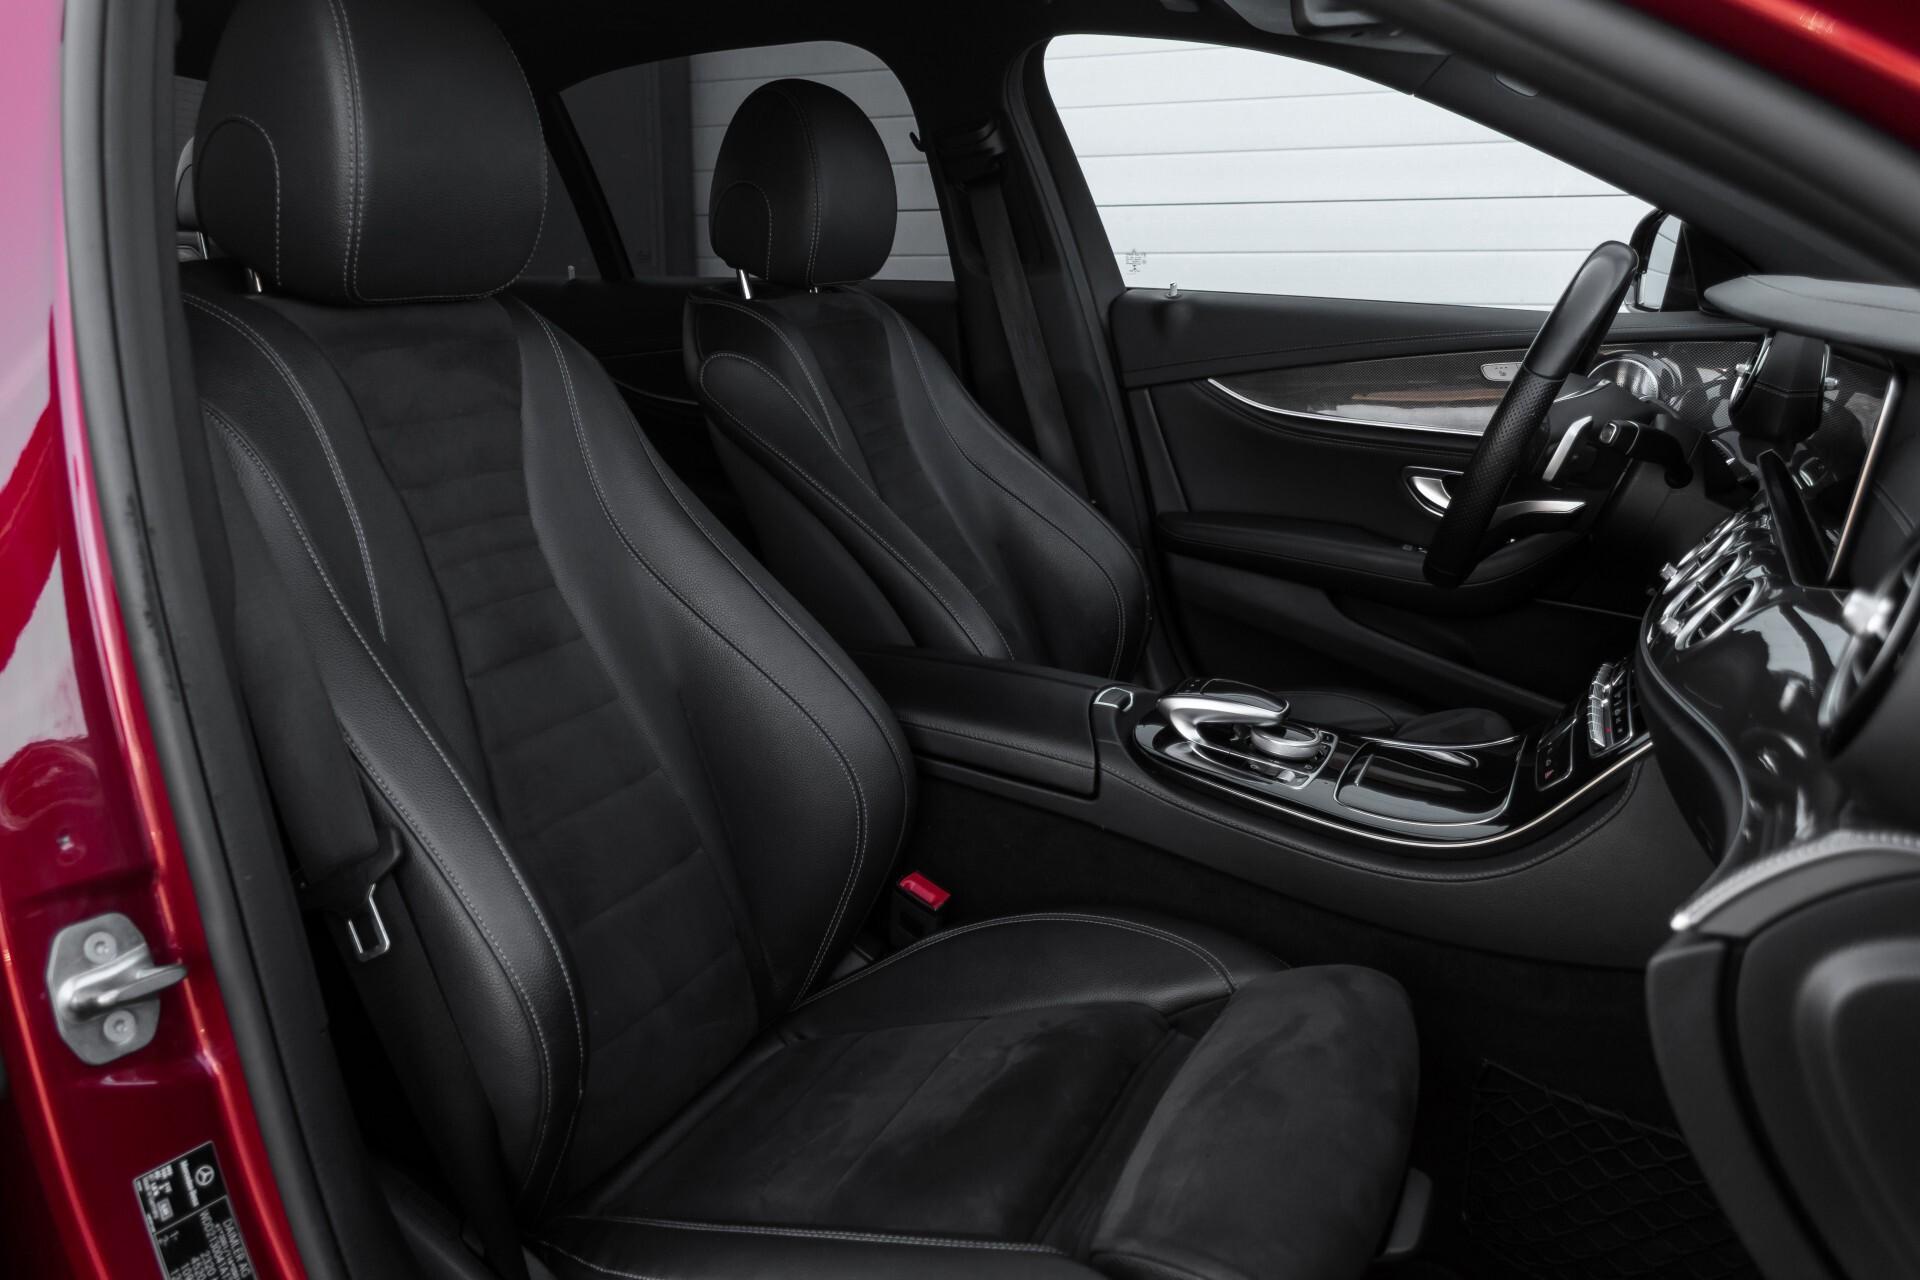 Mercedes-Benz E-Klasse 220 d AMG Night Distronic/Widescreen/Burmester/Schuifdak/Standkachel Aut9 Foto 3